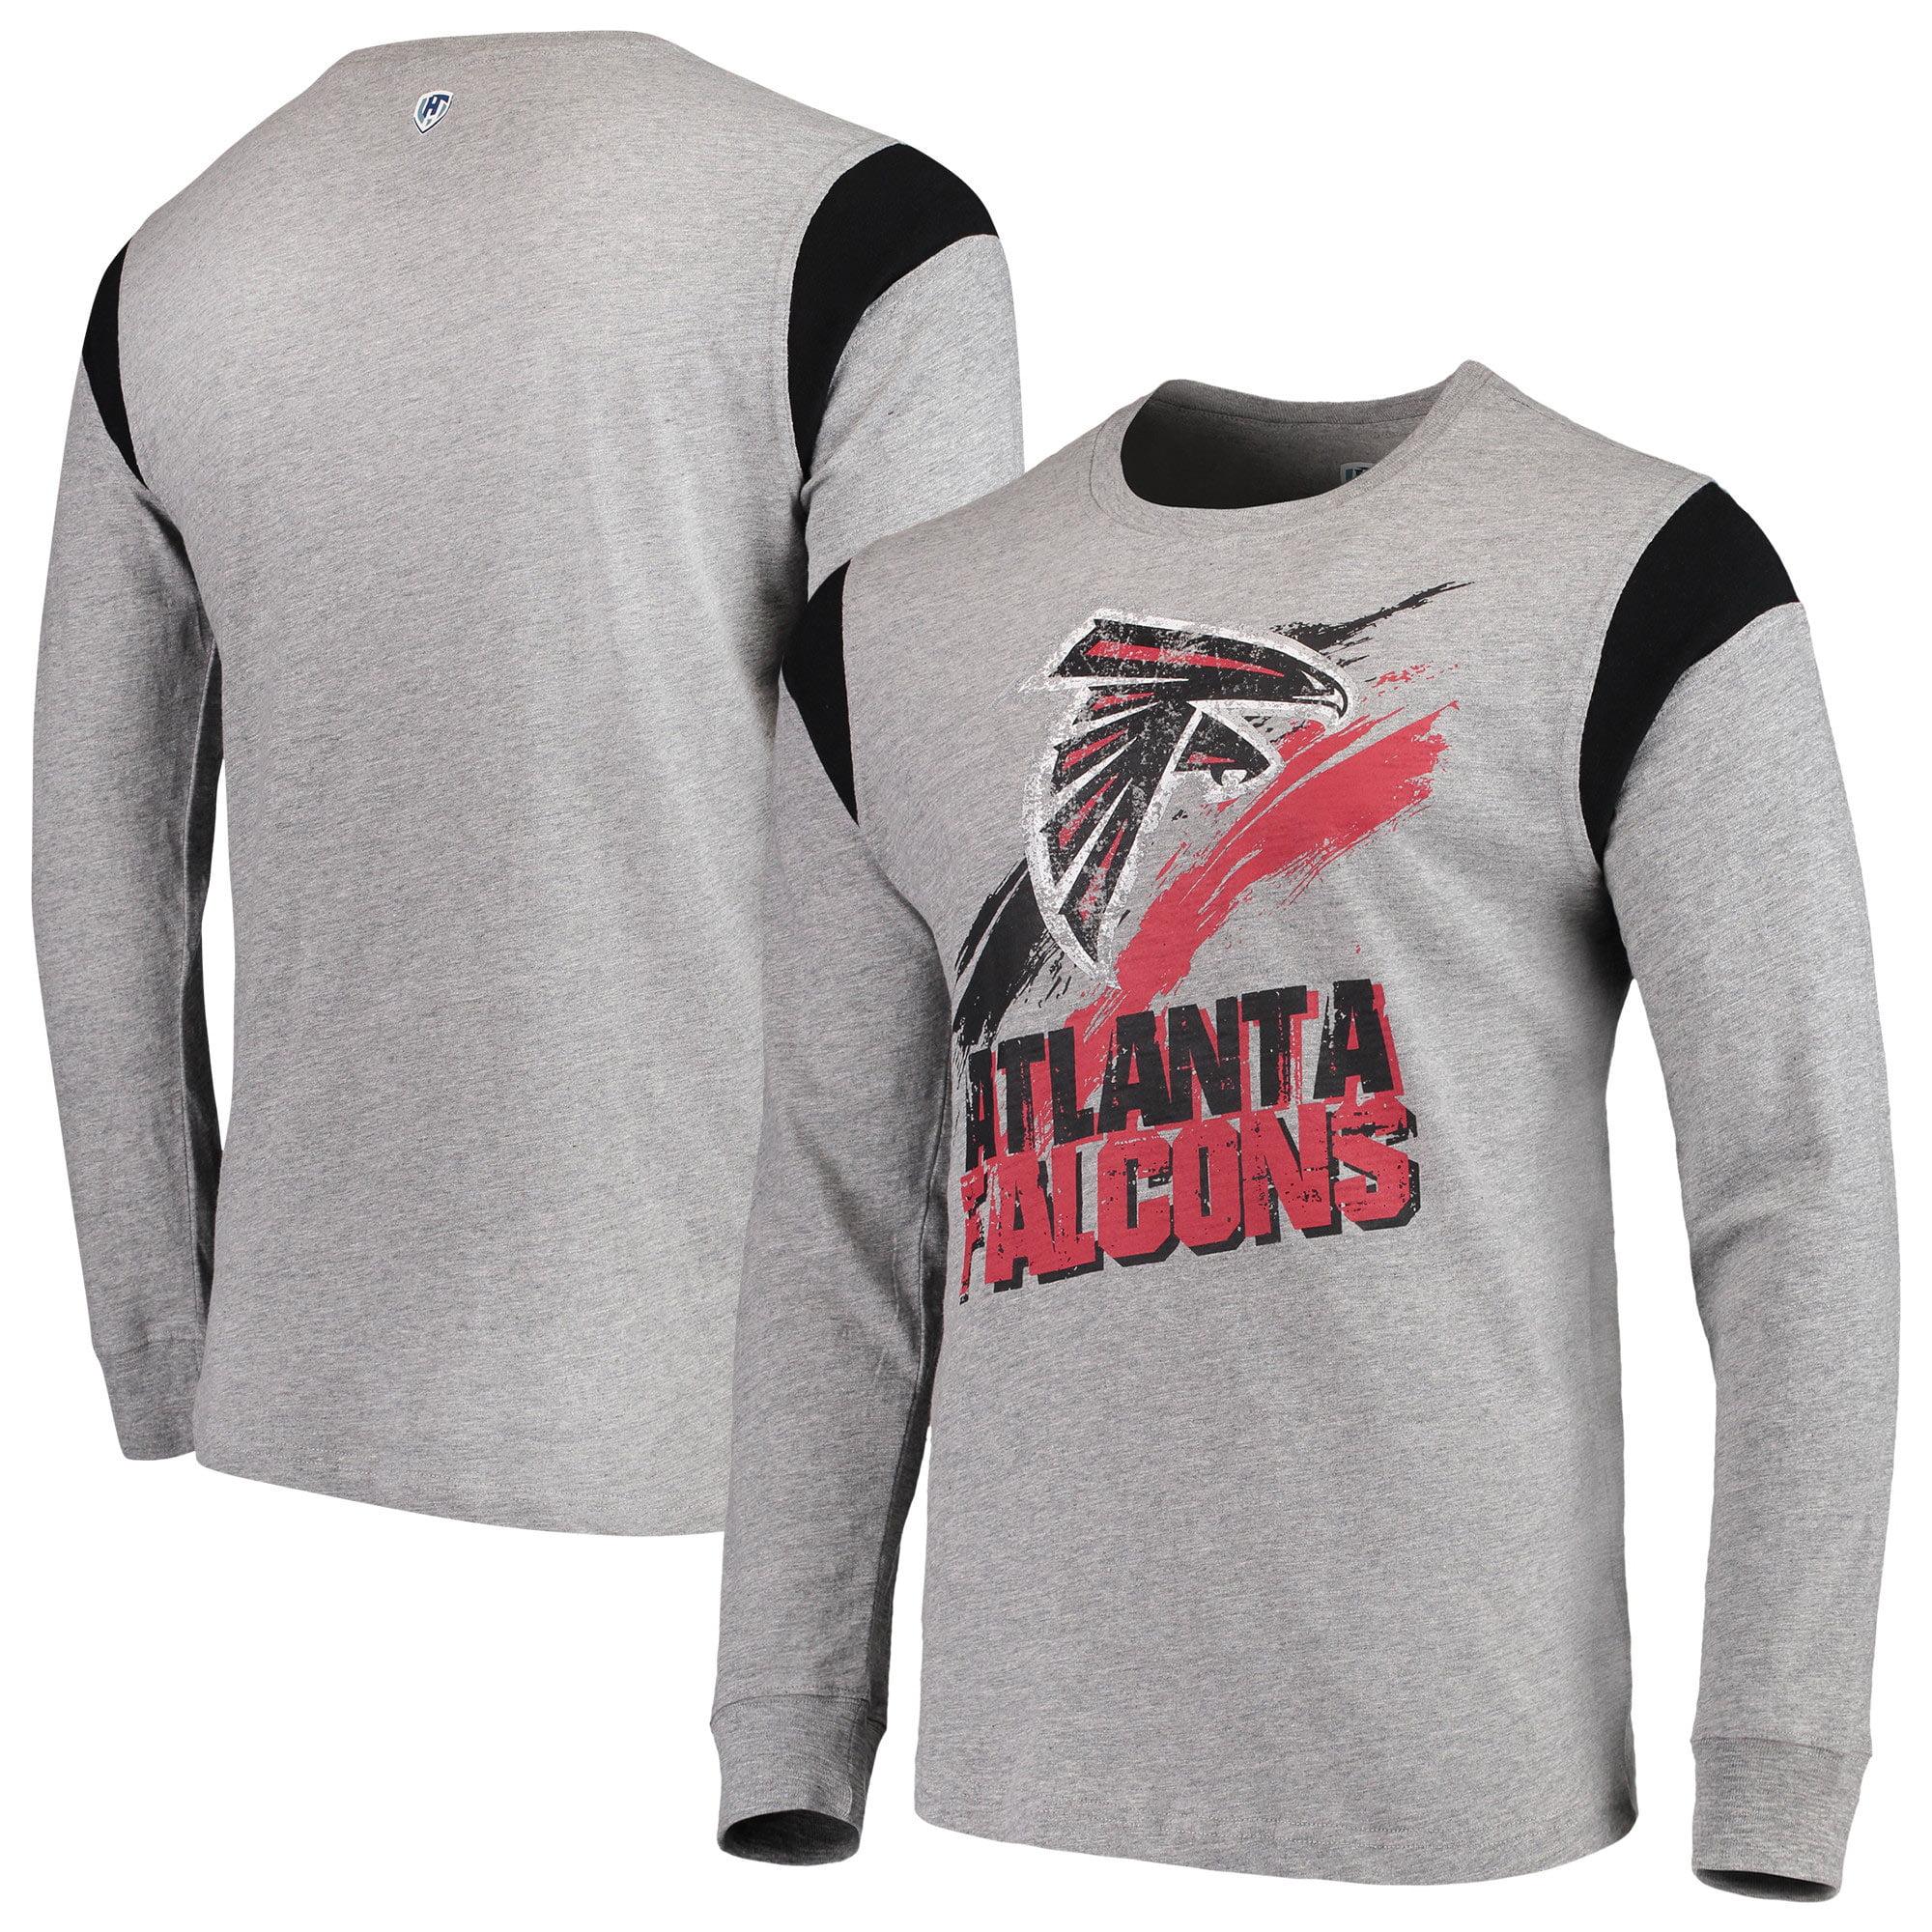 Atlanta Falcons G-III Sports by Carl Banks Wide Receiver Long Sleeve T-Shirt - Heathered Gray/Black